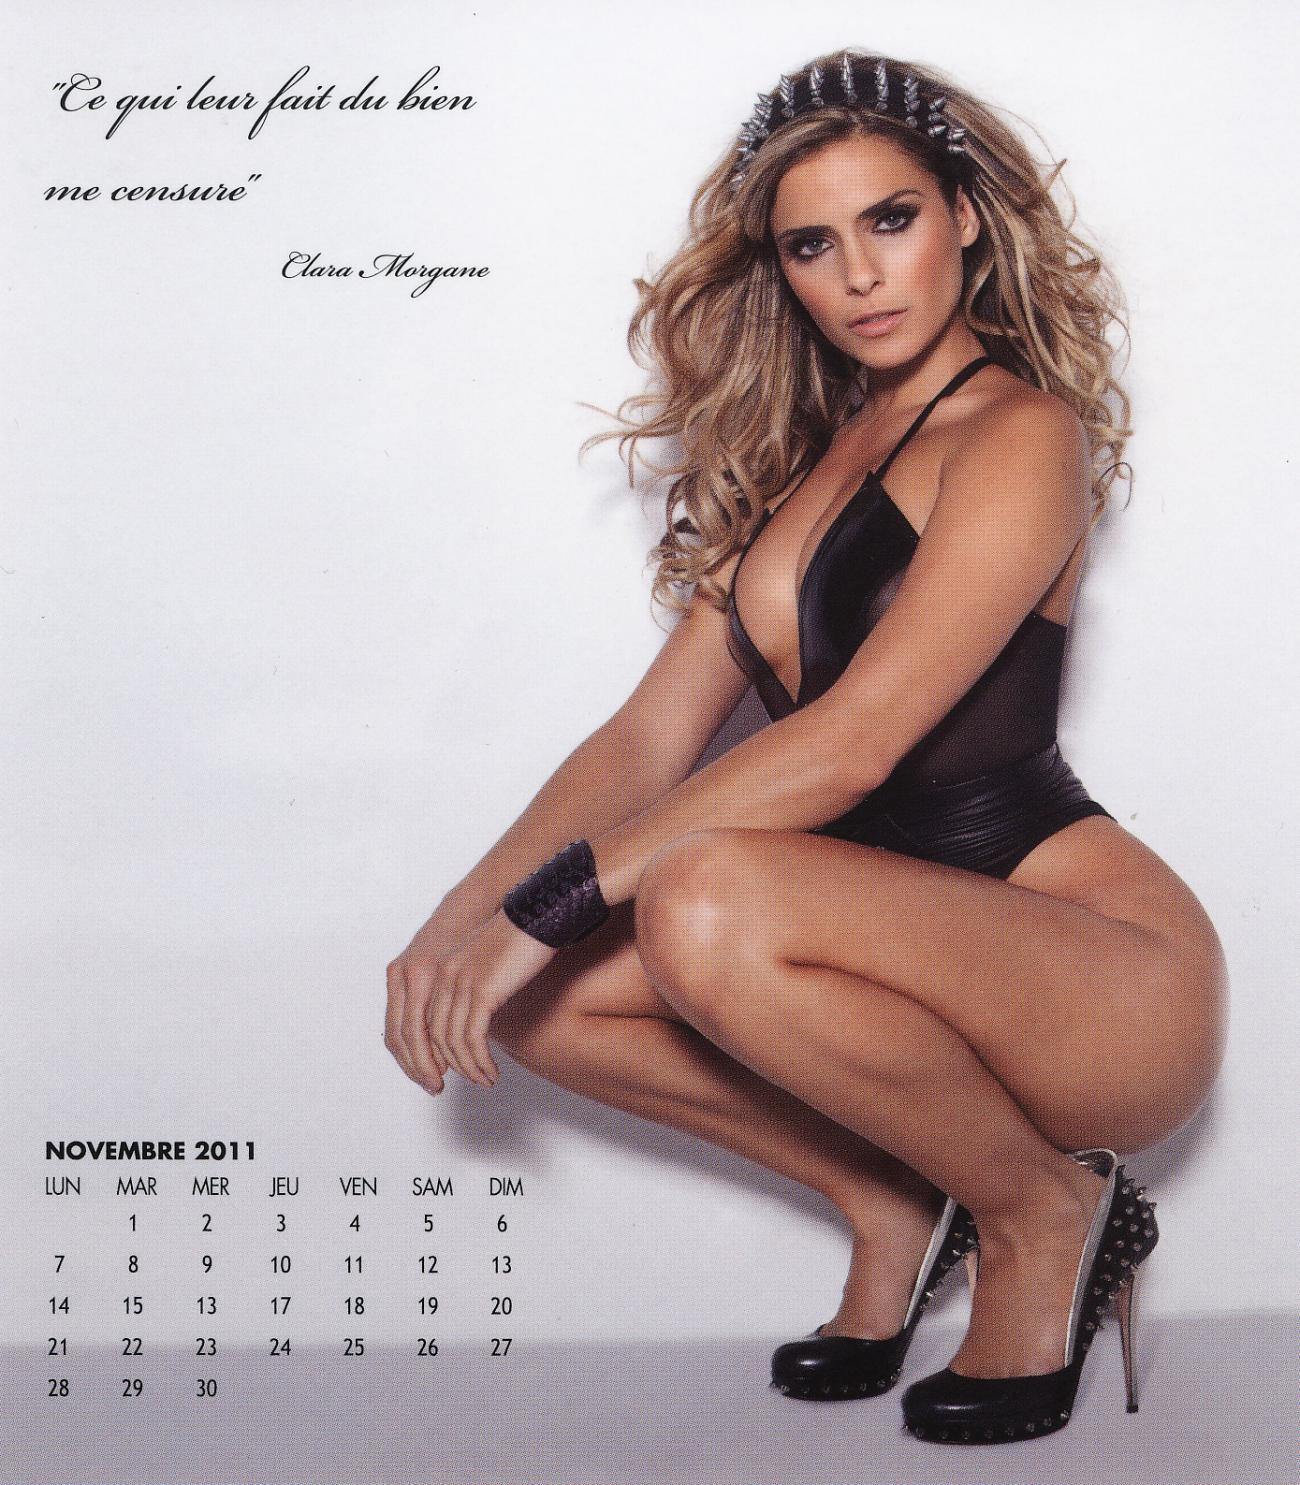 Clara morgane calendar agree